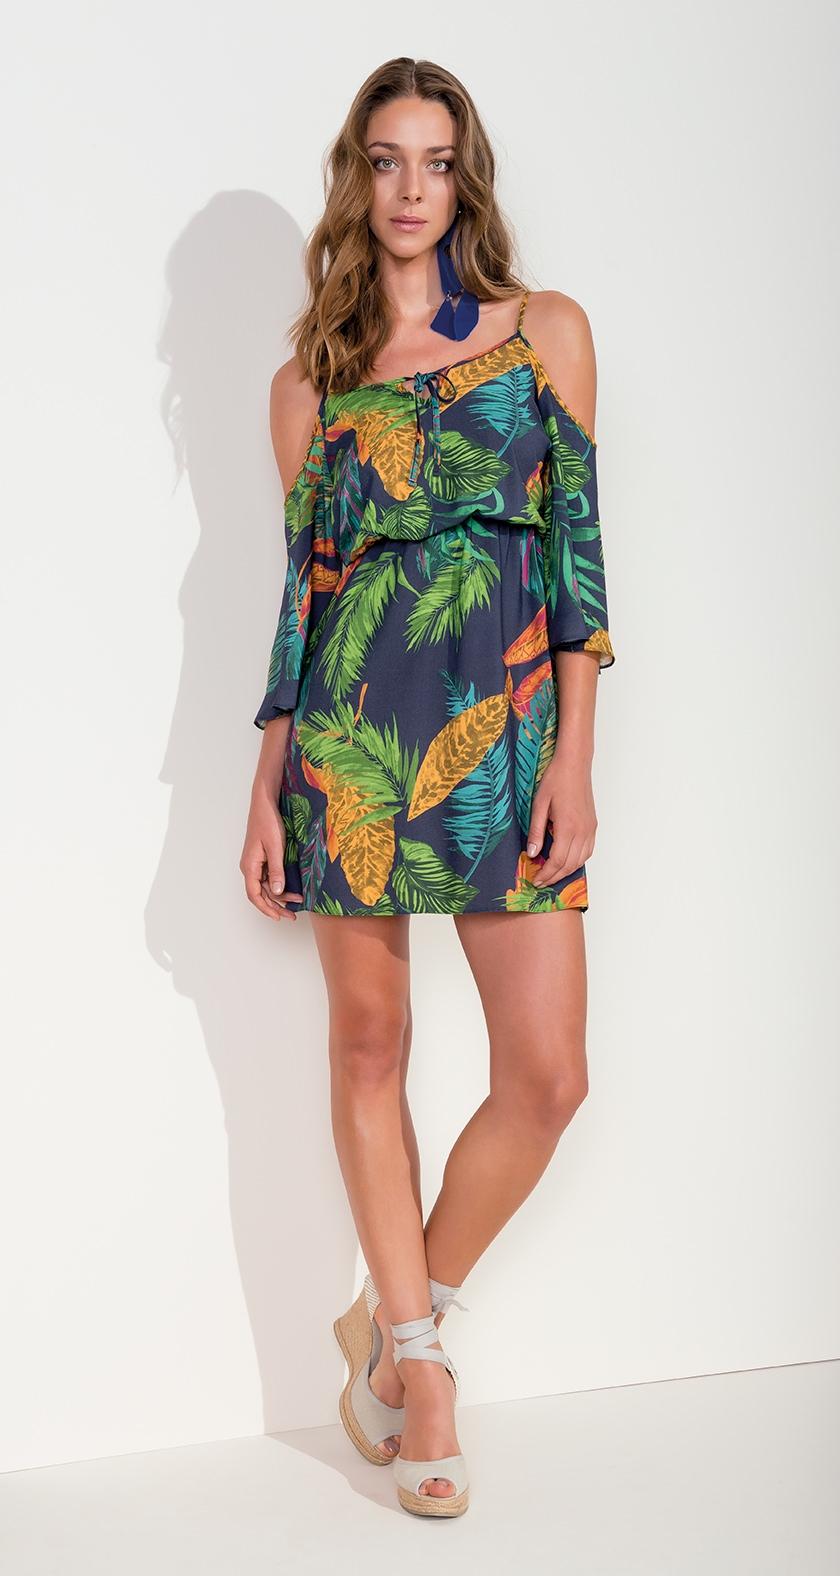 71f51d09b vestido curto ombros vazados estilo cigana estampado folhas botanico